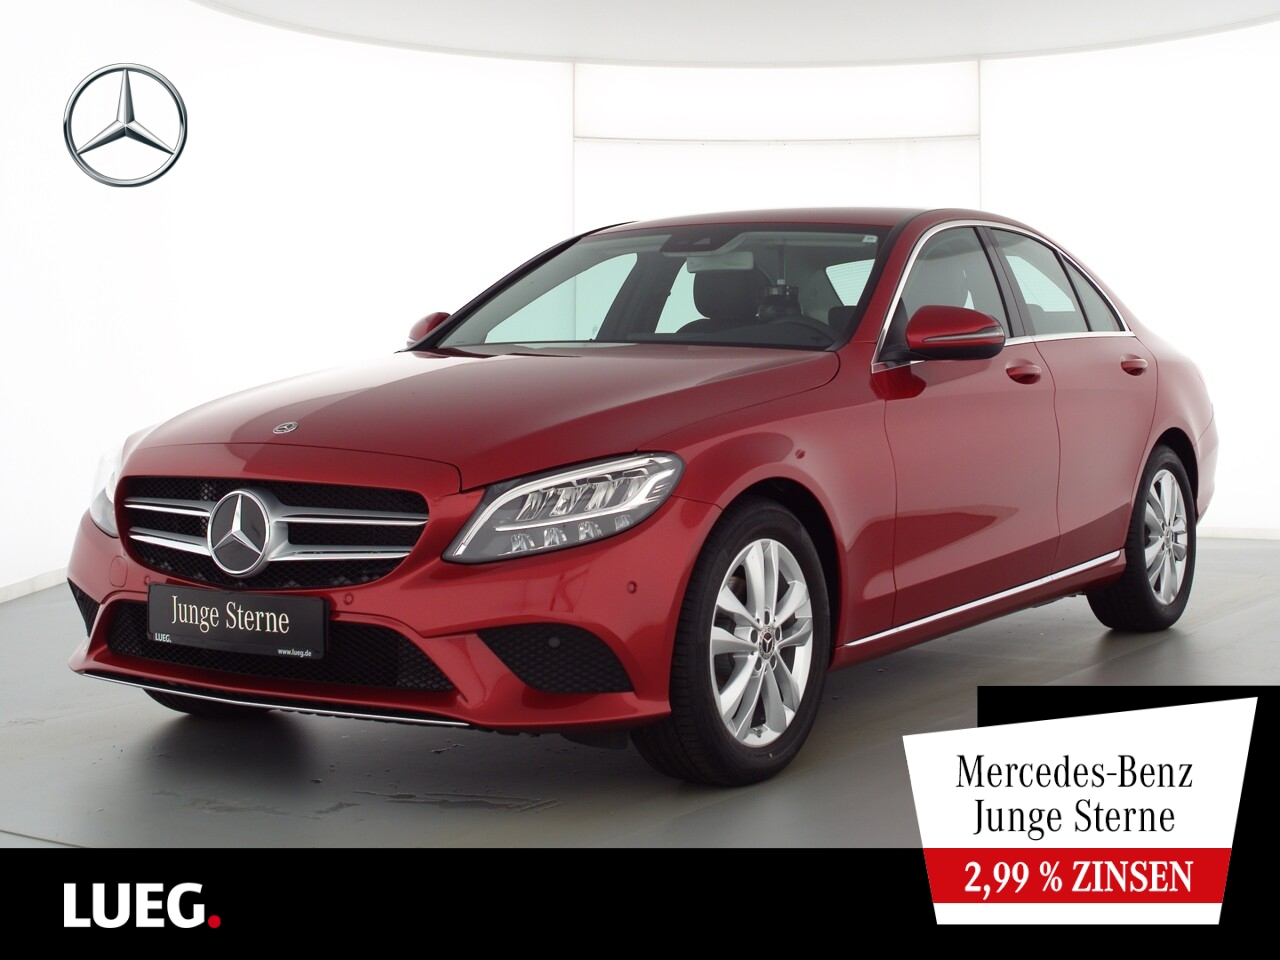 Mercedes-Benz C 180 Avantgarde+Navi+LED-HP+CarPl+ParkA+Kamera, Jahr 2020, Benzin